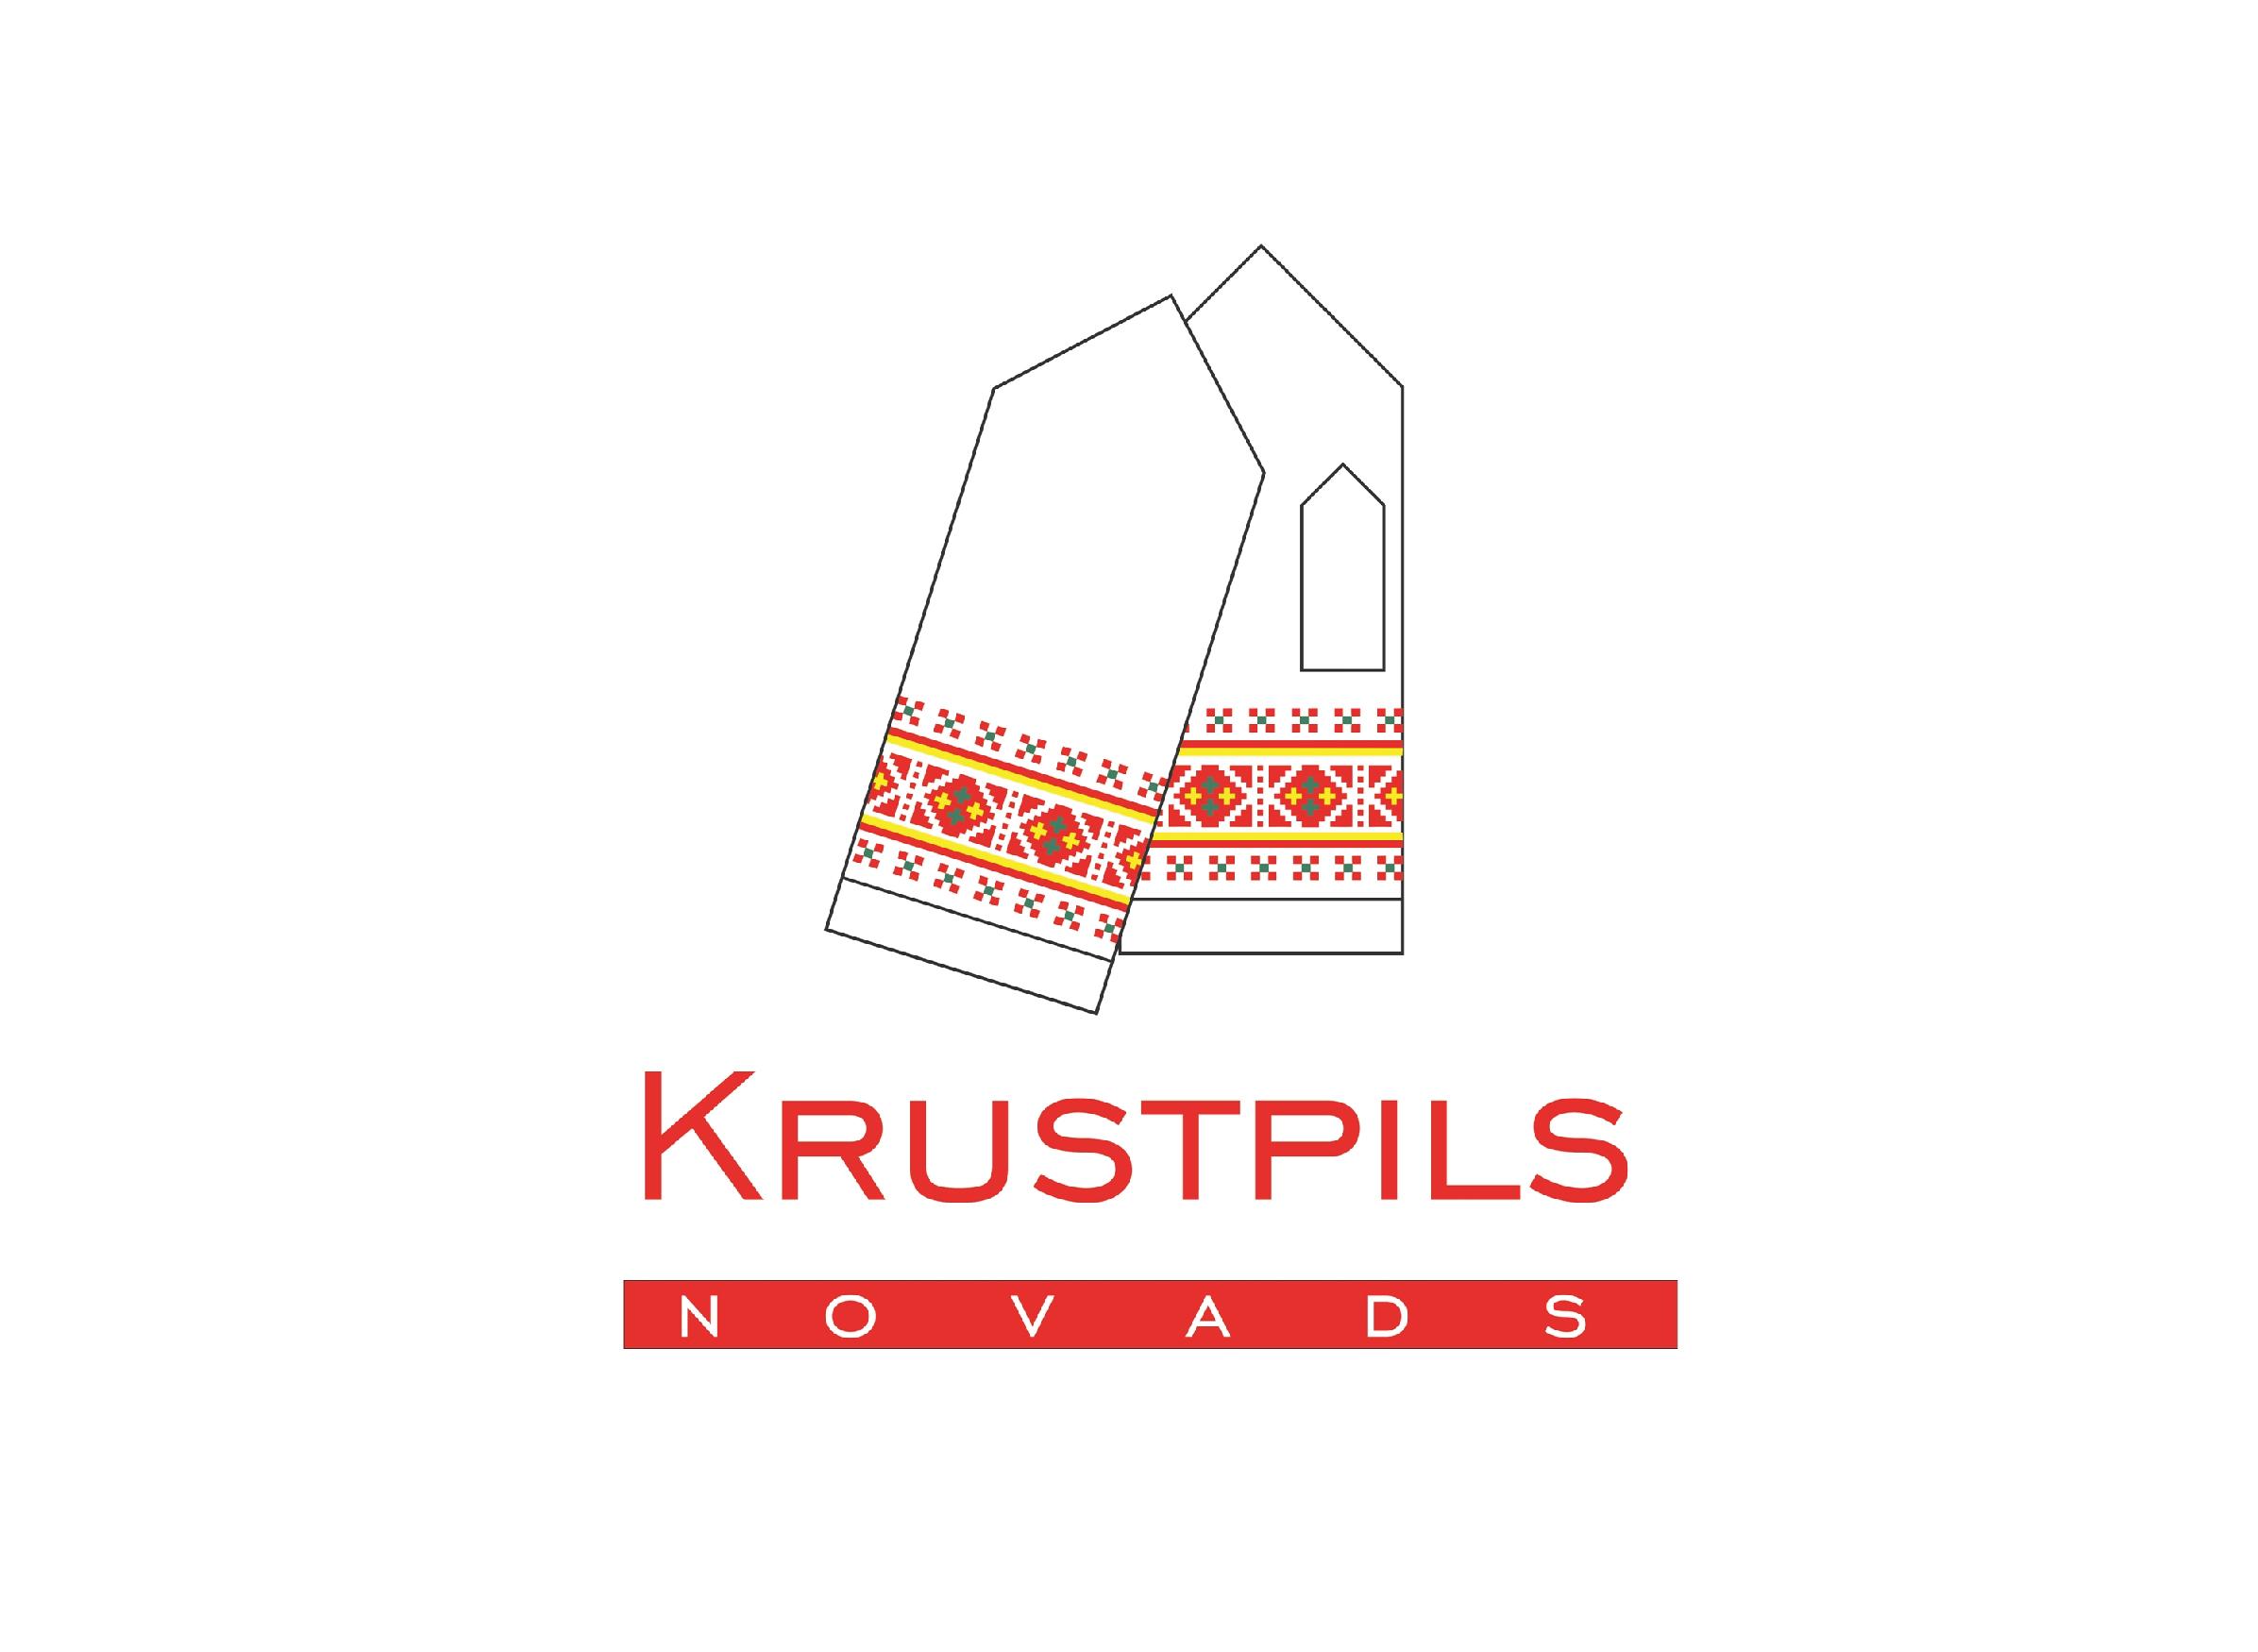 <strong>Krustpils novada pašvaldība</strong>